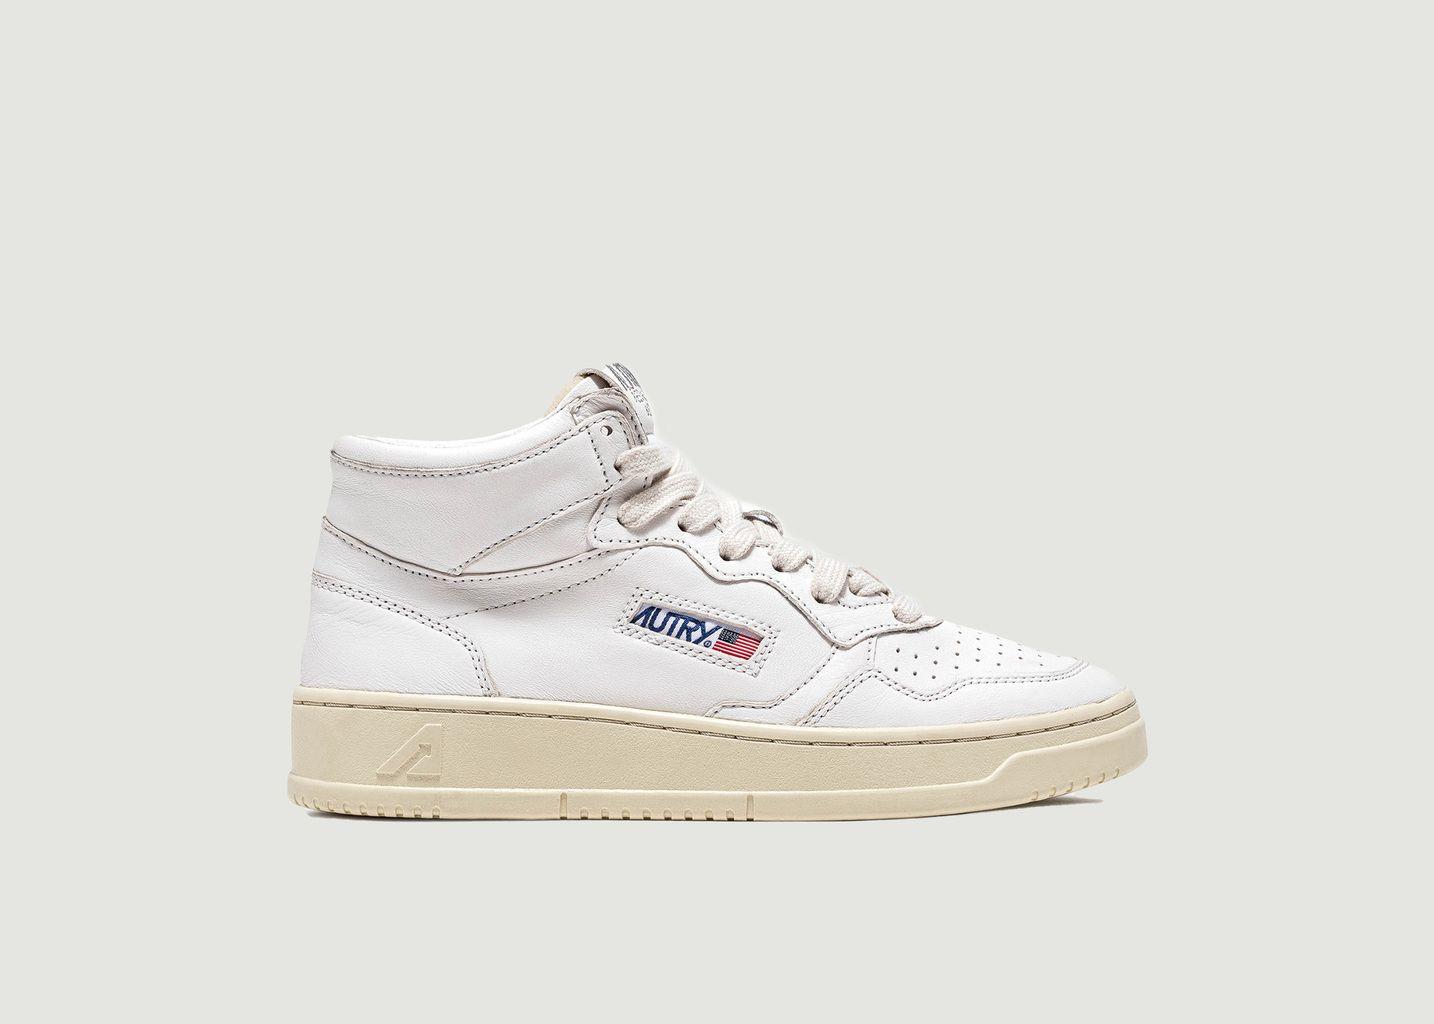 Sneakers Mid 01 - AUTRY